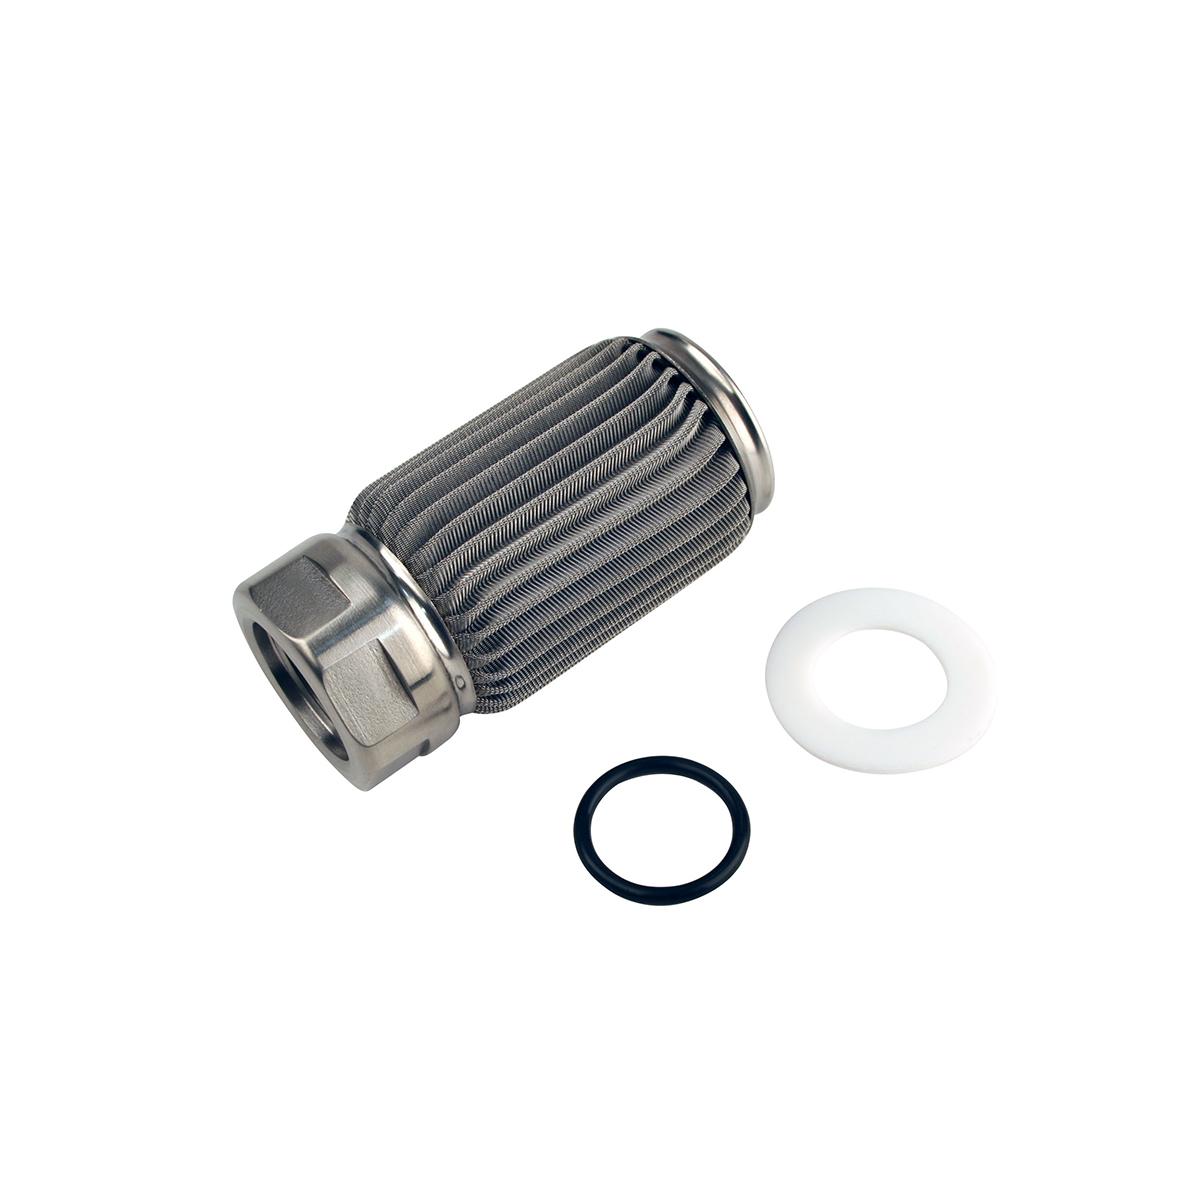 Fuel Filter Kit Evasive Motorsports Exhaust Aeromotive Element Crimp An 10 100 Micron Ss